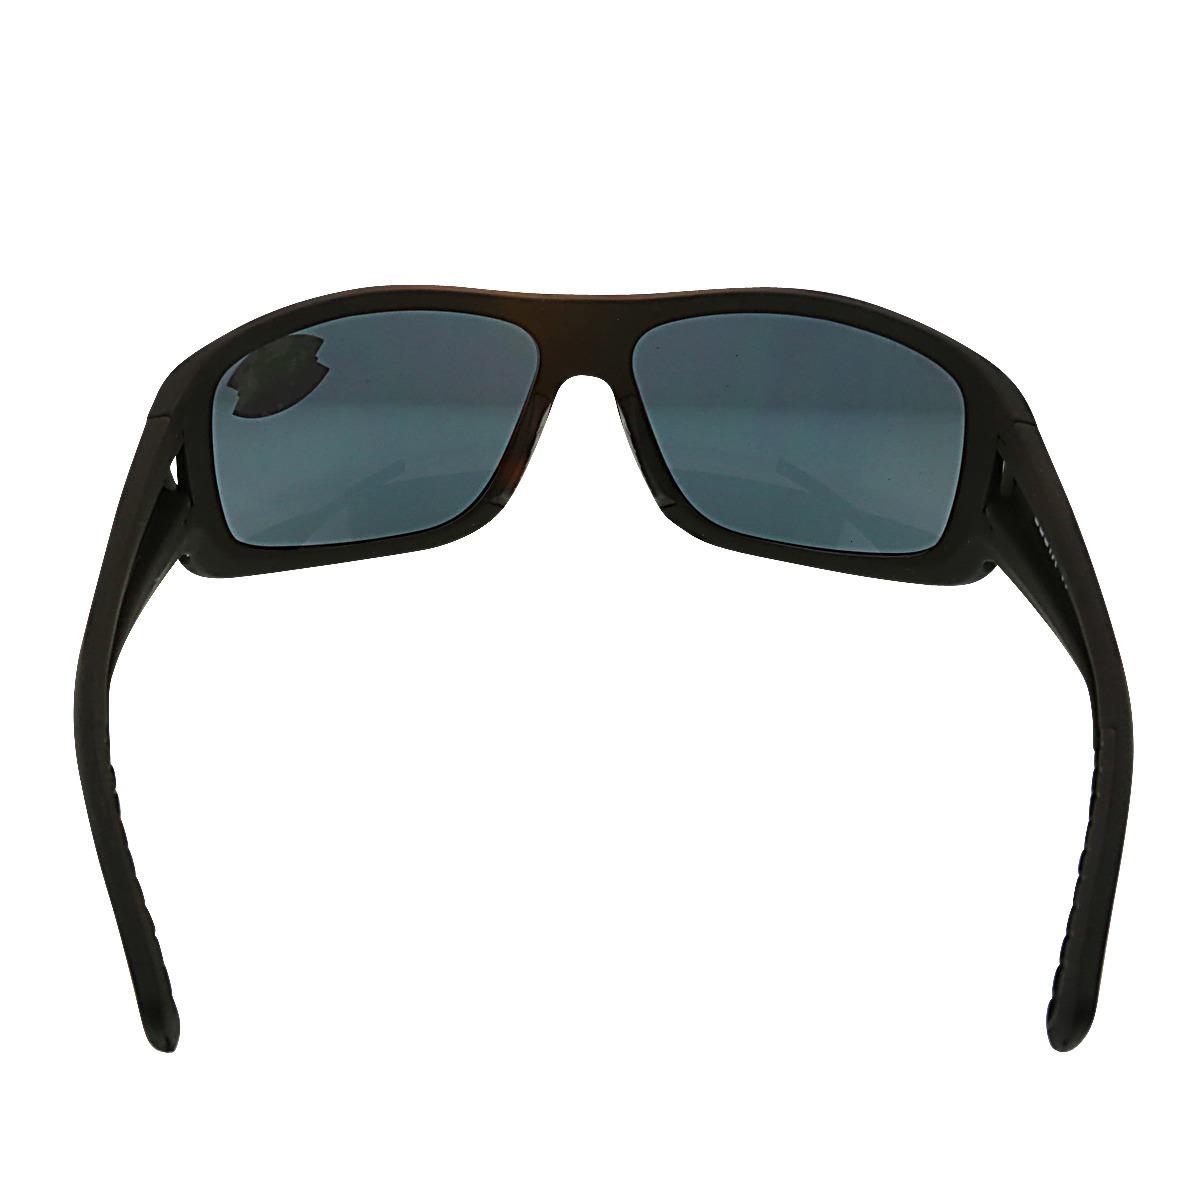 5a88c88c46 Costa Del Mar Montauk Polarized Sunglasses MTK 187 OGP